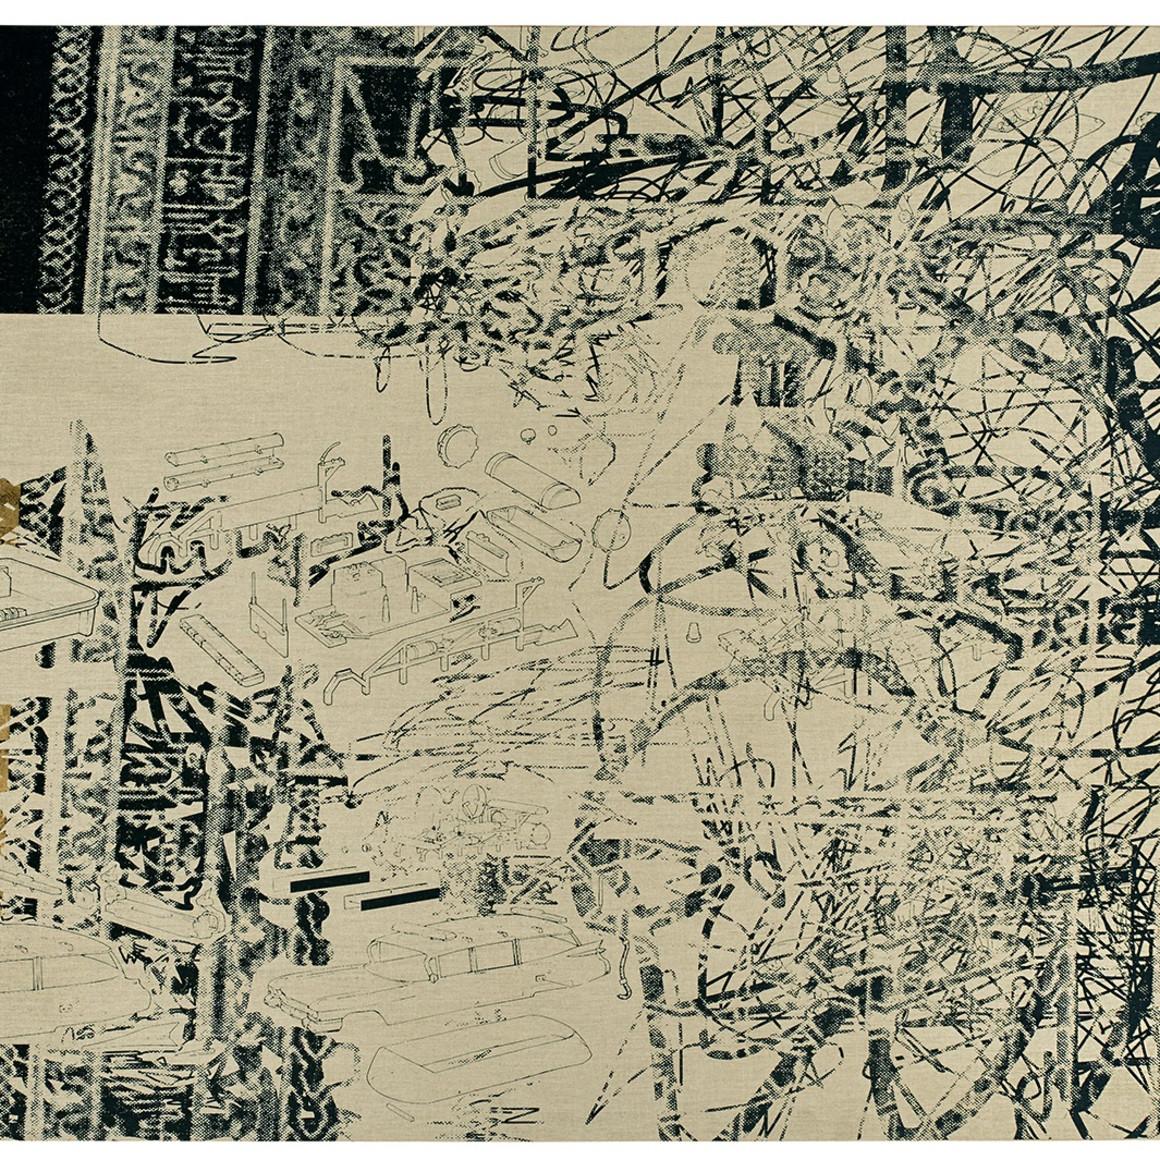 Zhivago Duncan, Over Stimulated Stimuli, 2015